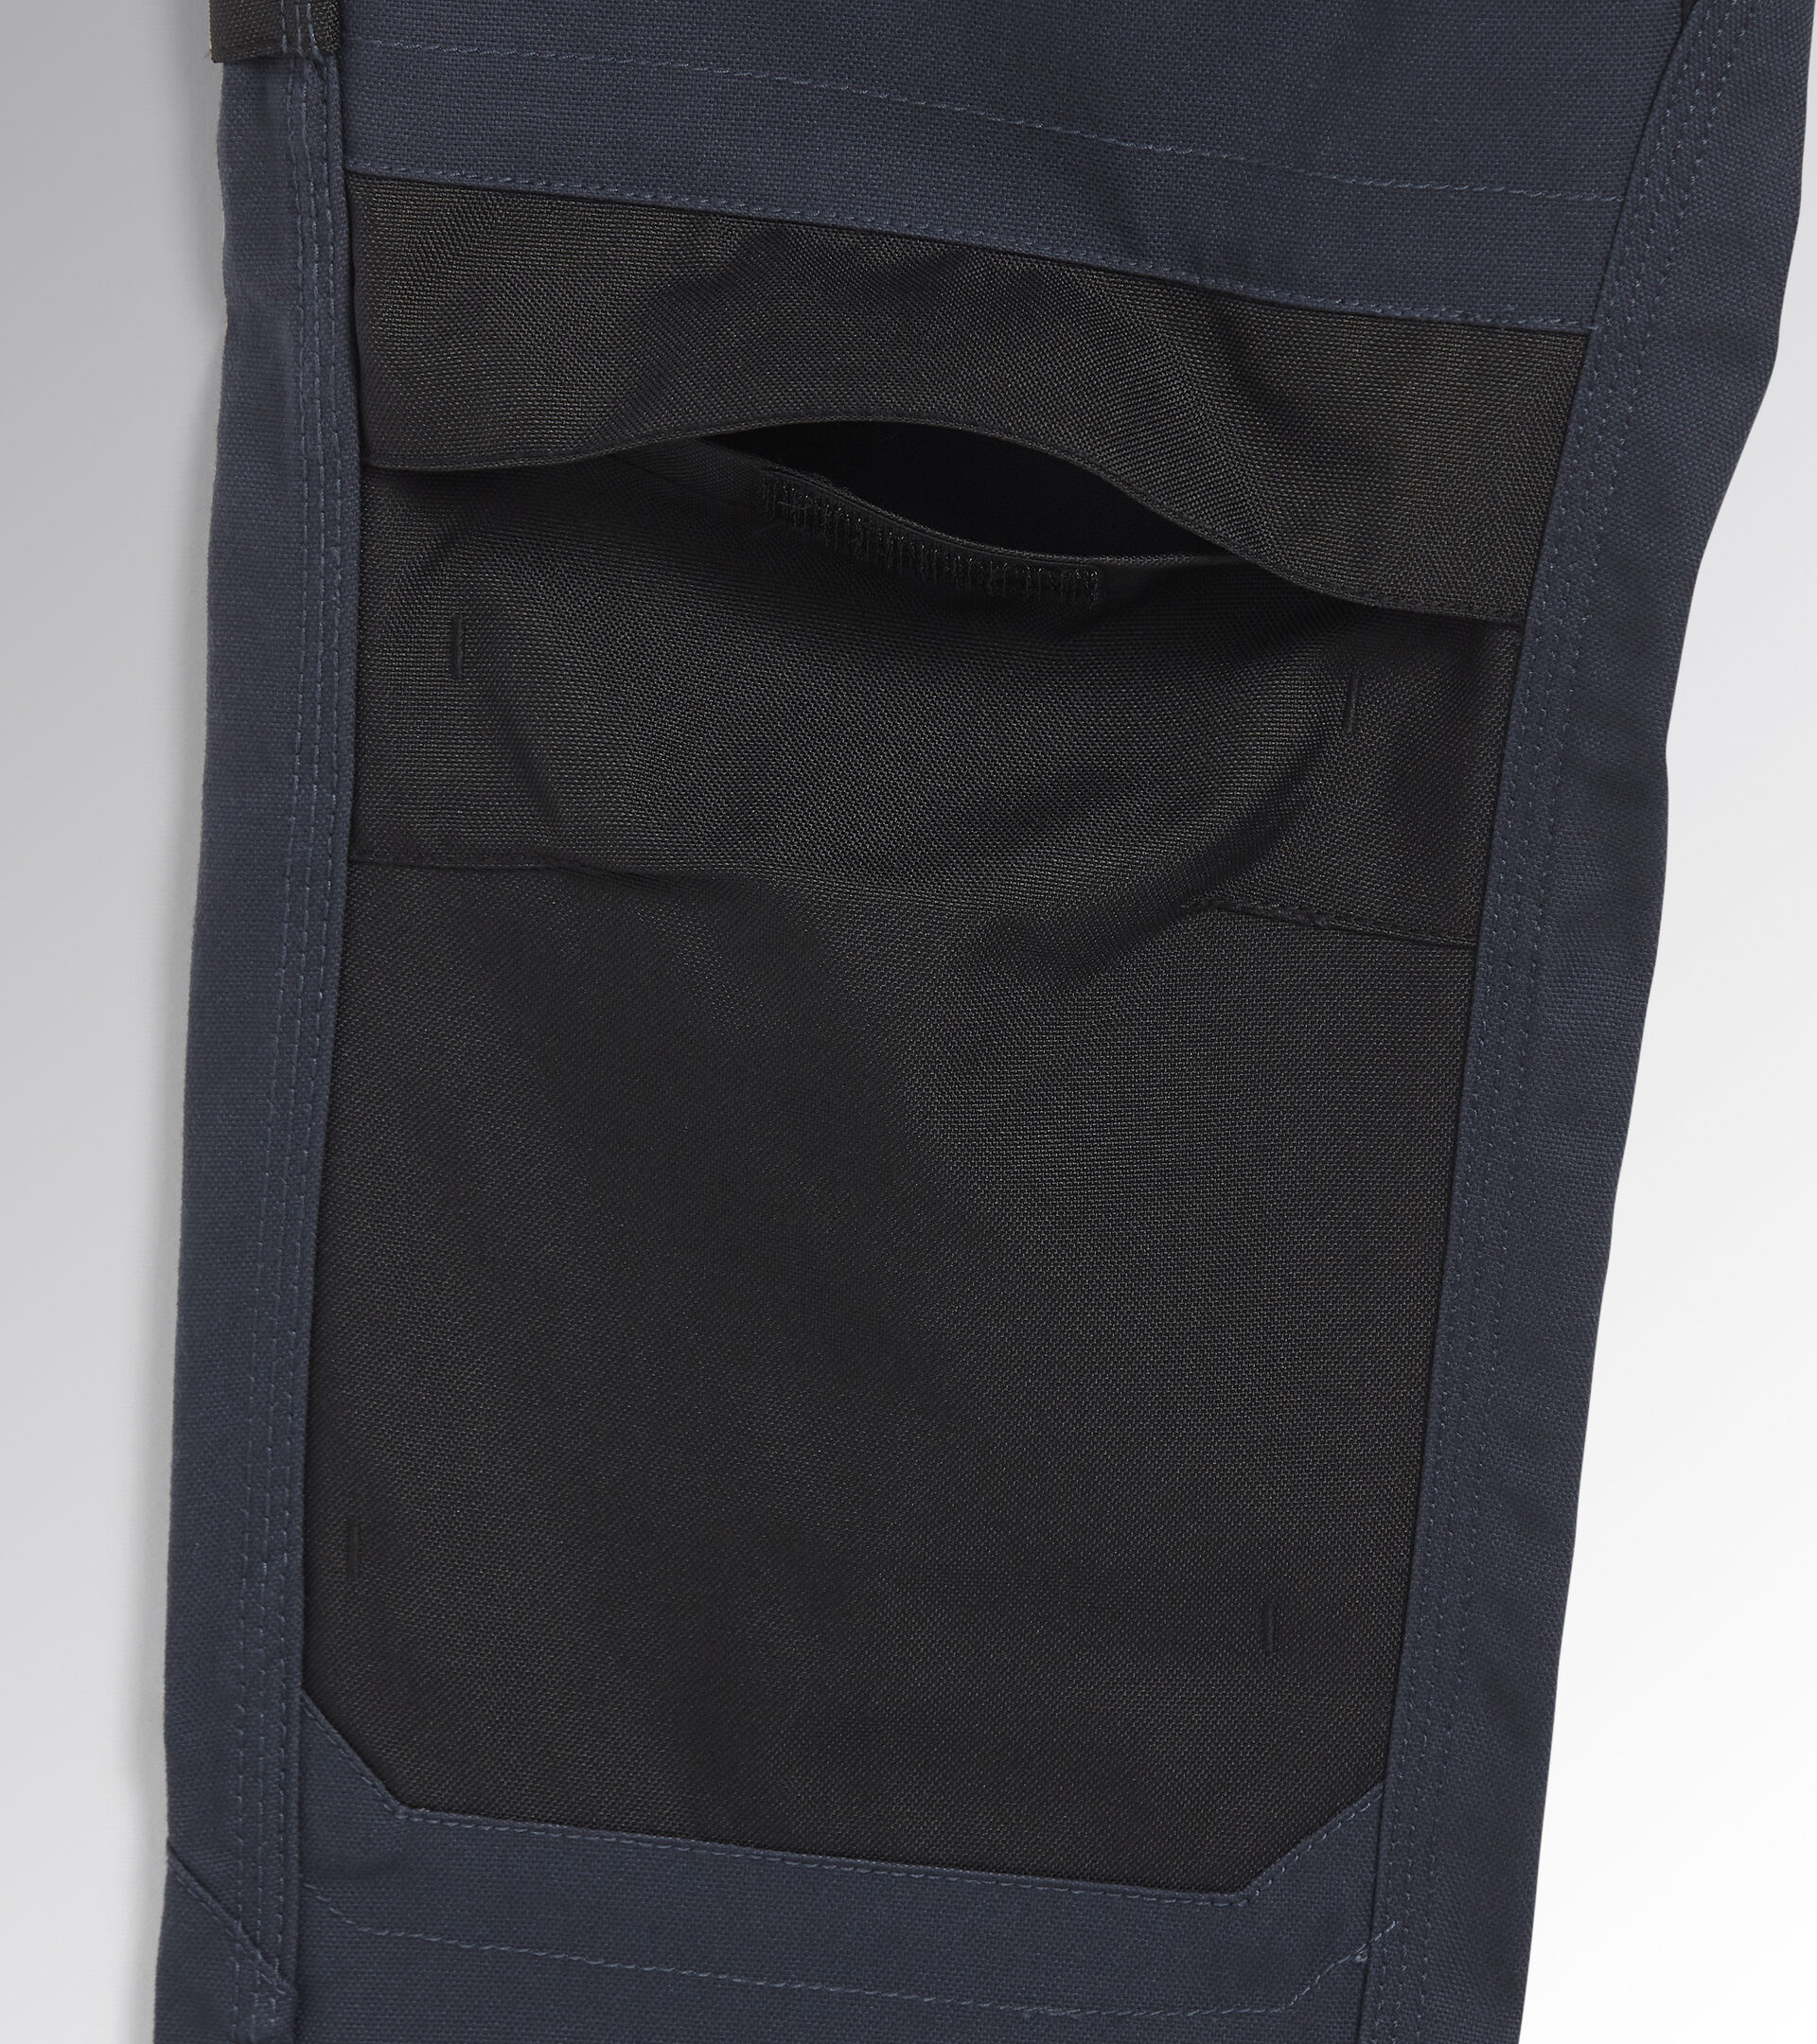 Apparel Utility UOMO PANT TOP PERFORMANCE BLUE DENIM Utility